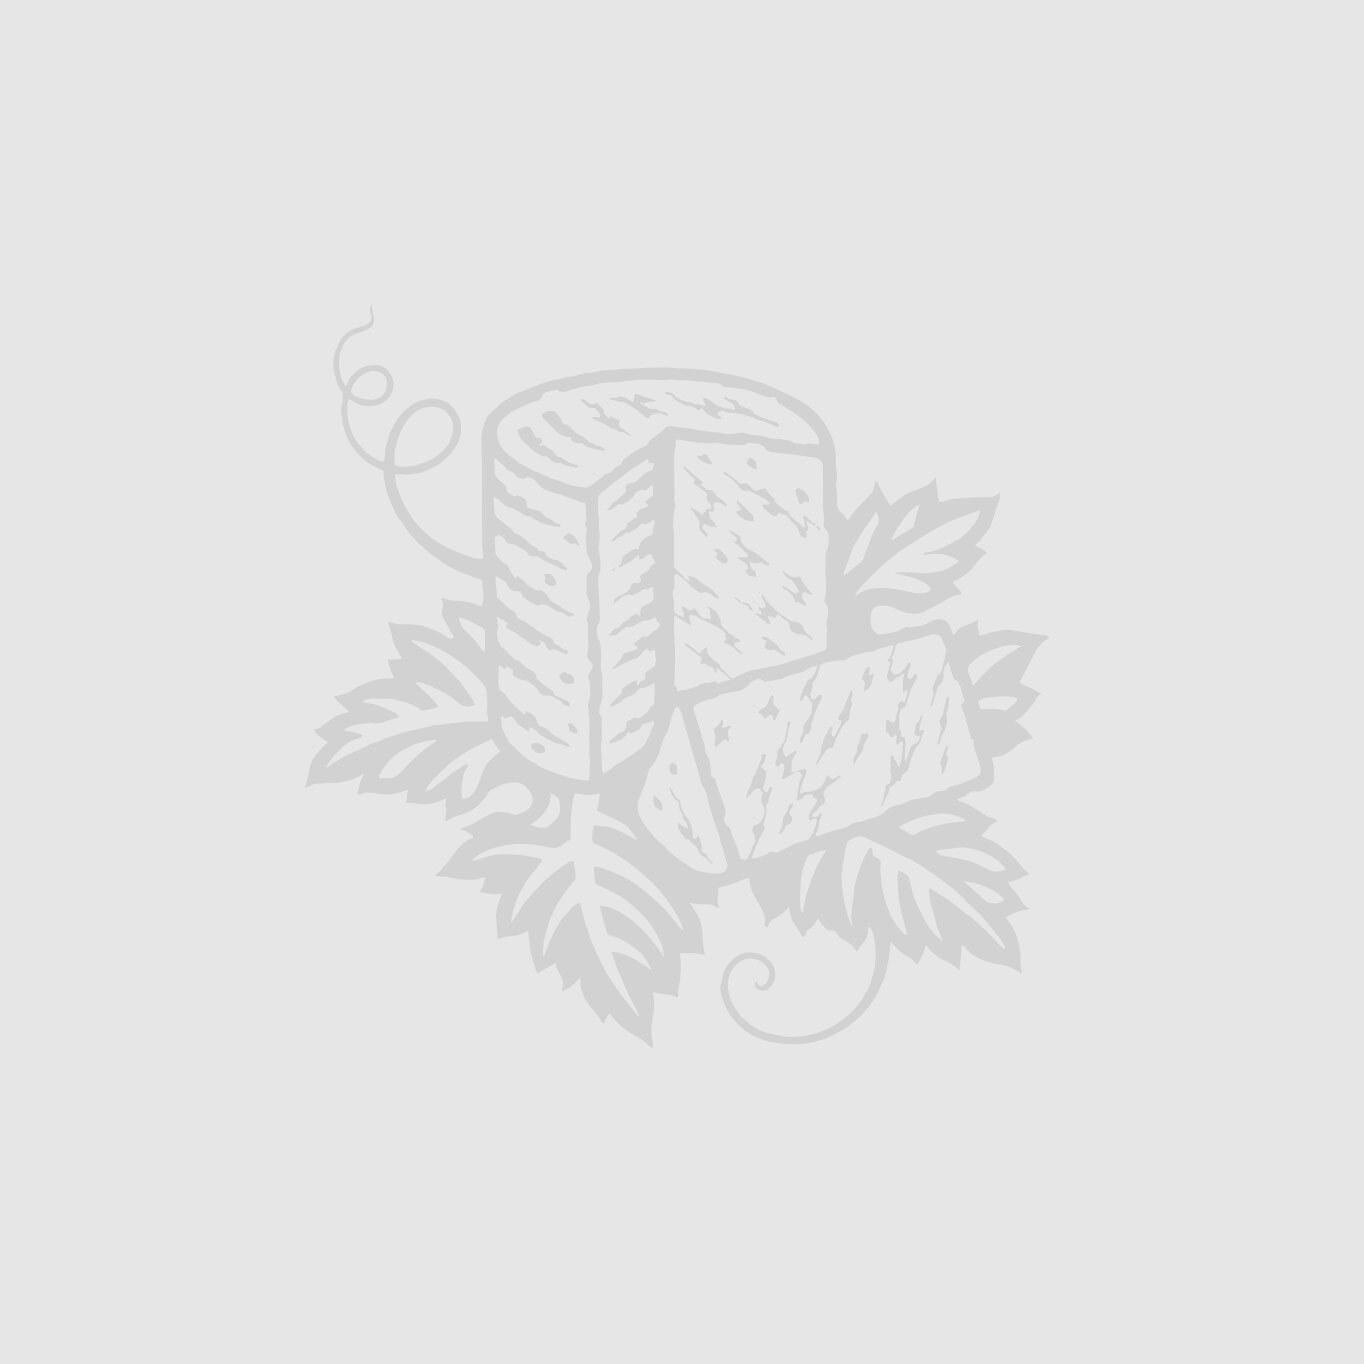 Marzolino d'Etruria (Pecorino Dolce)